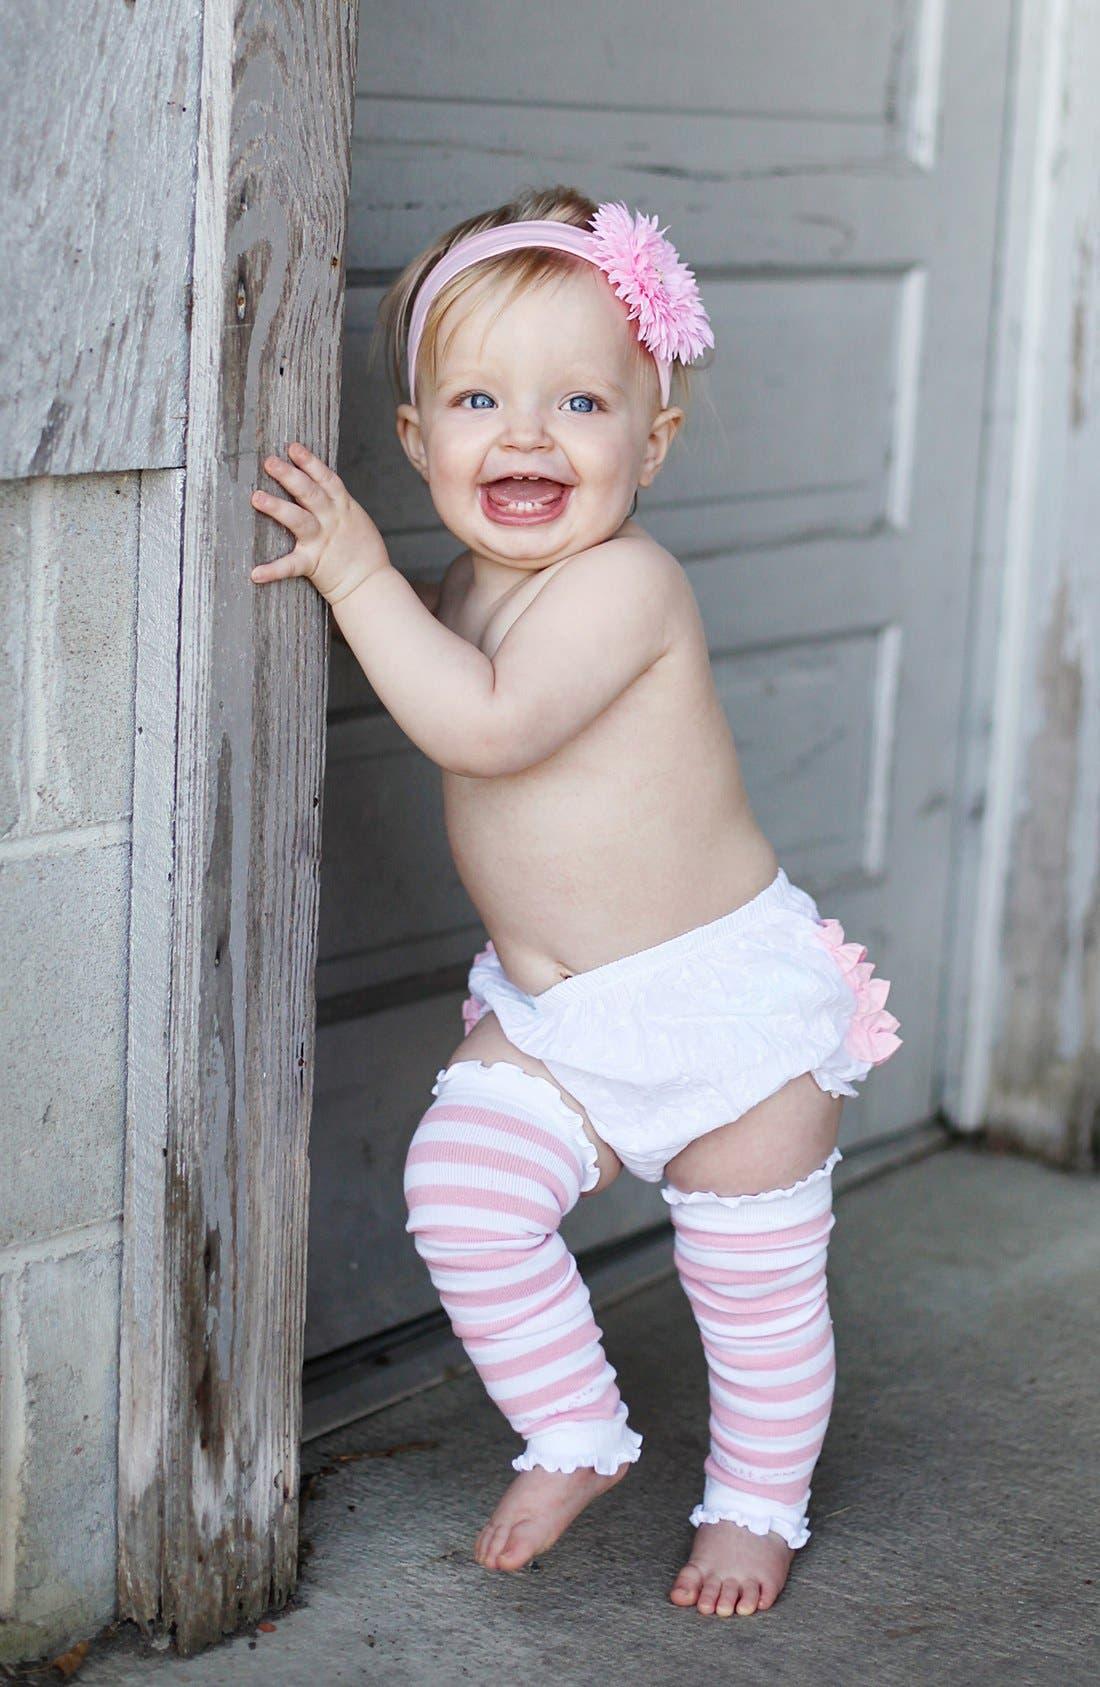 Alternate Image 3  - RuffleButts 'Pink & White' Headband, Bloomers & Leg Warmers (Baby)